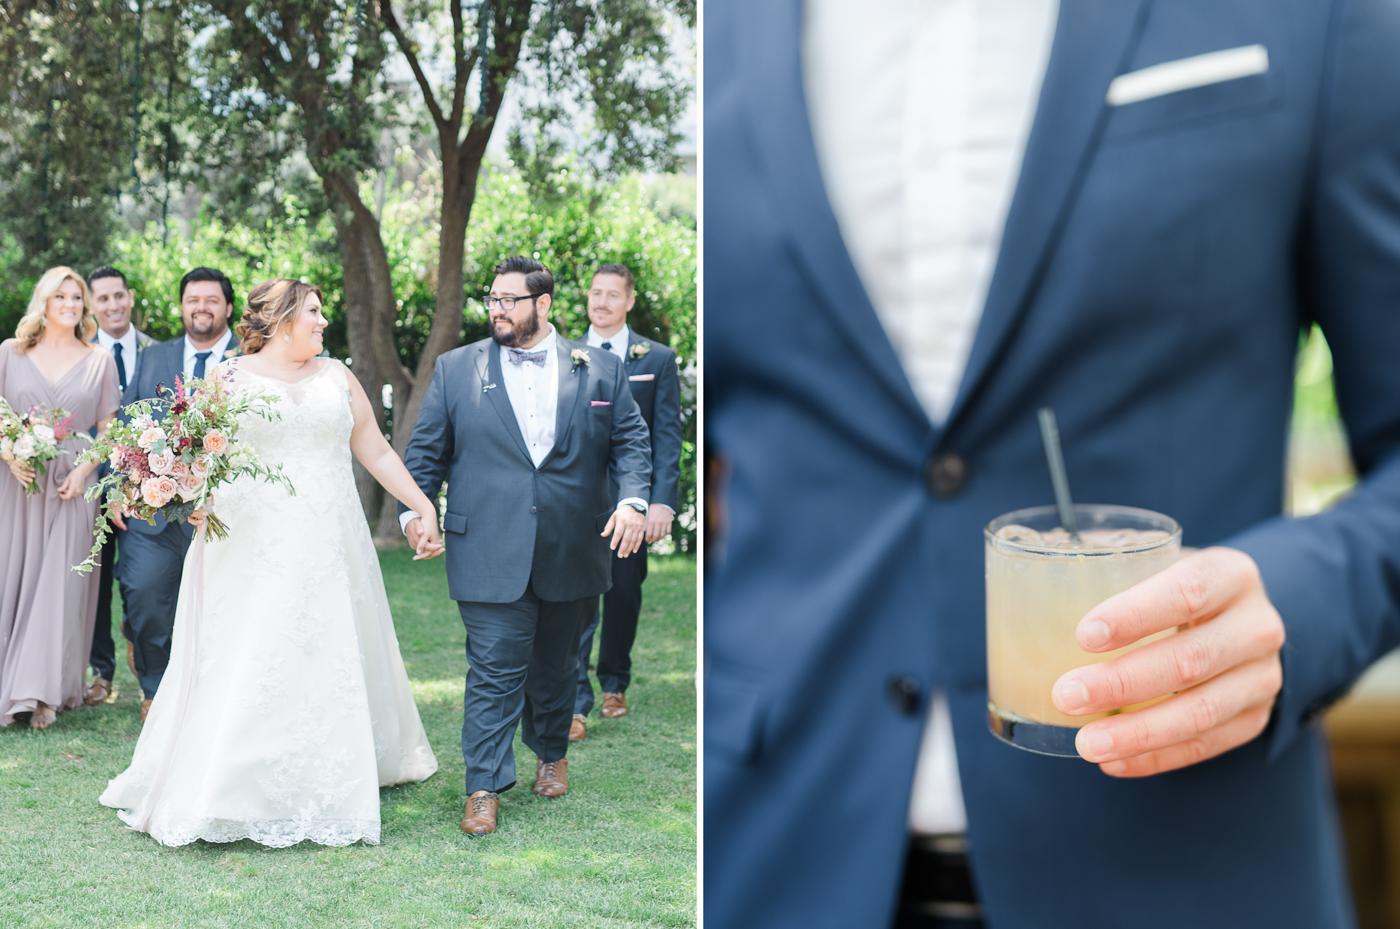 Christen & Dominic - Gorgeous Wedding at The Victorian, Santa Monica ...